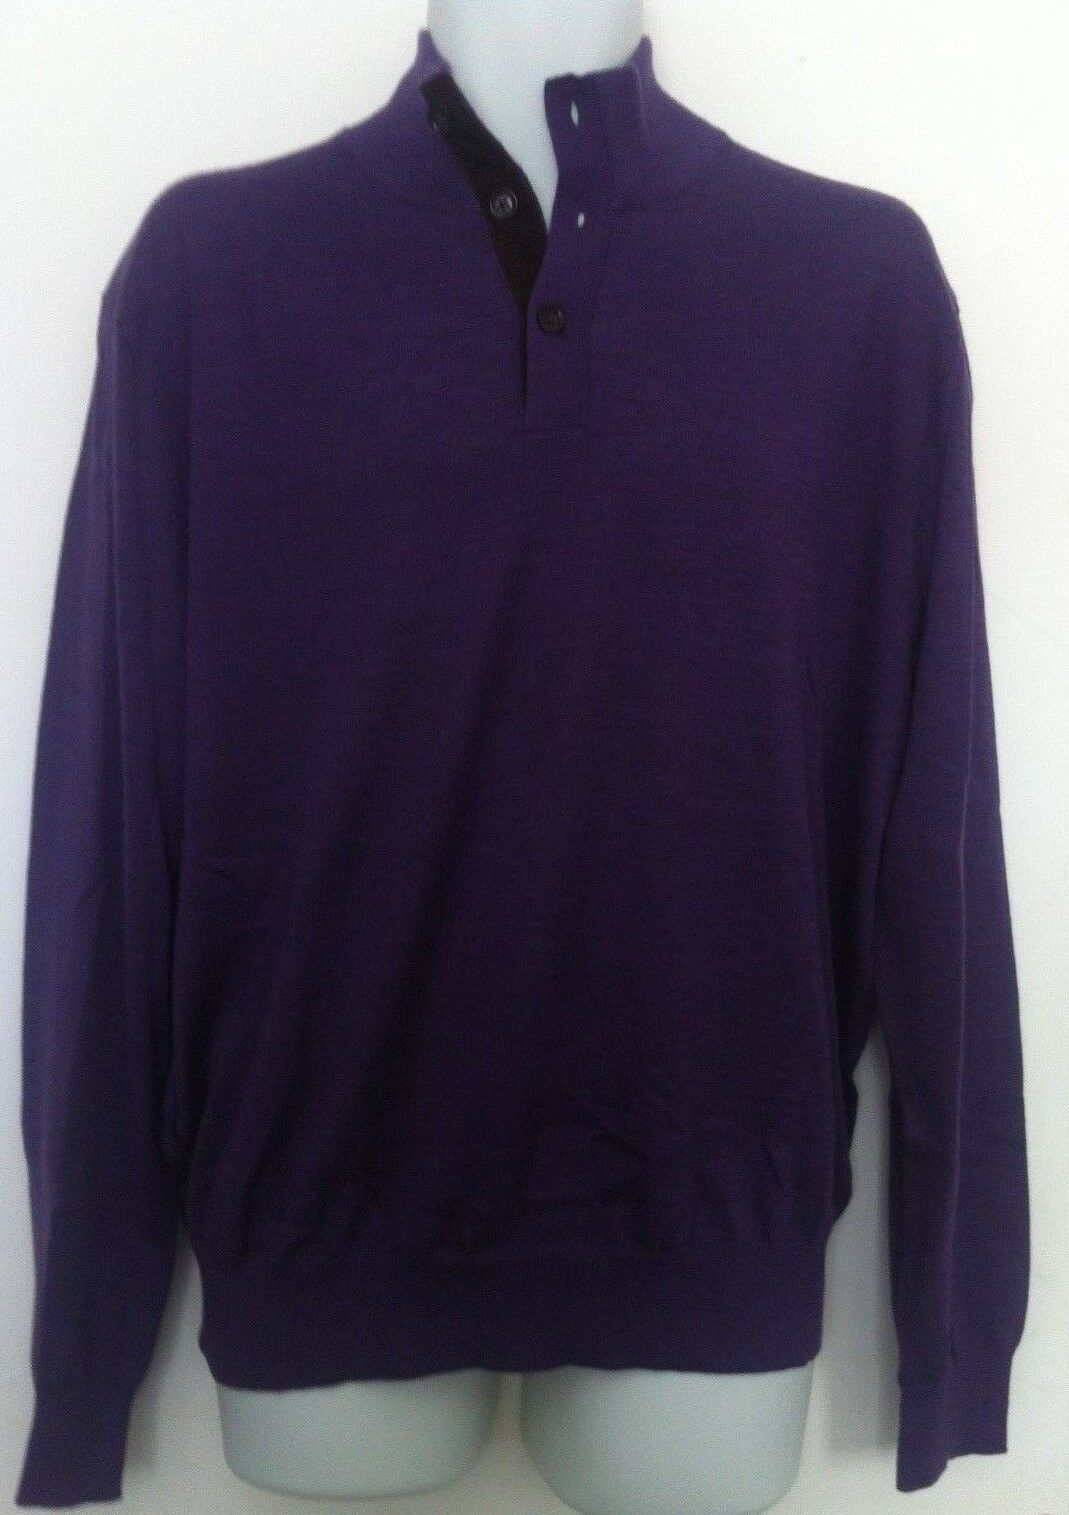 Polo Ralph Lauren Sweater Solid Purple Merino Wool Buttons Sz XL ...